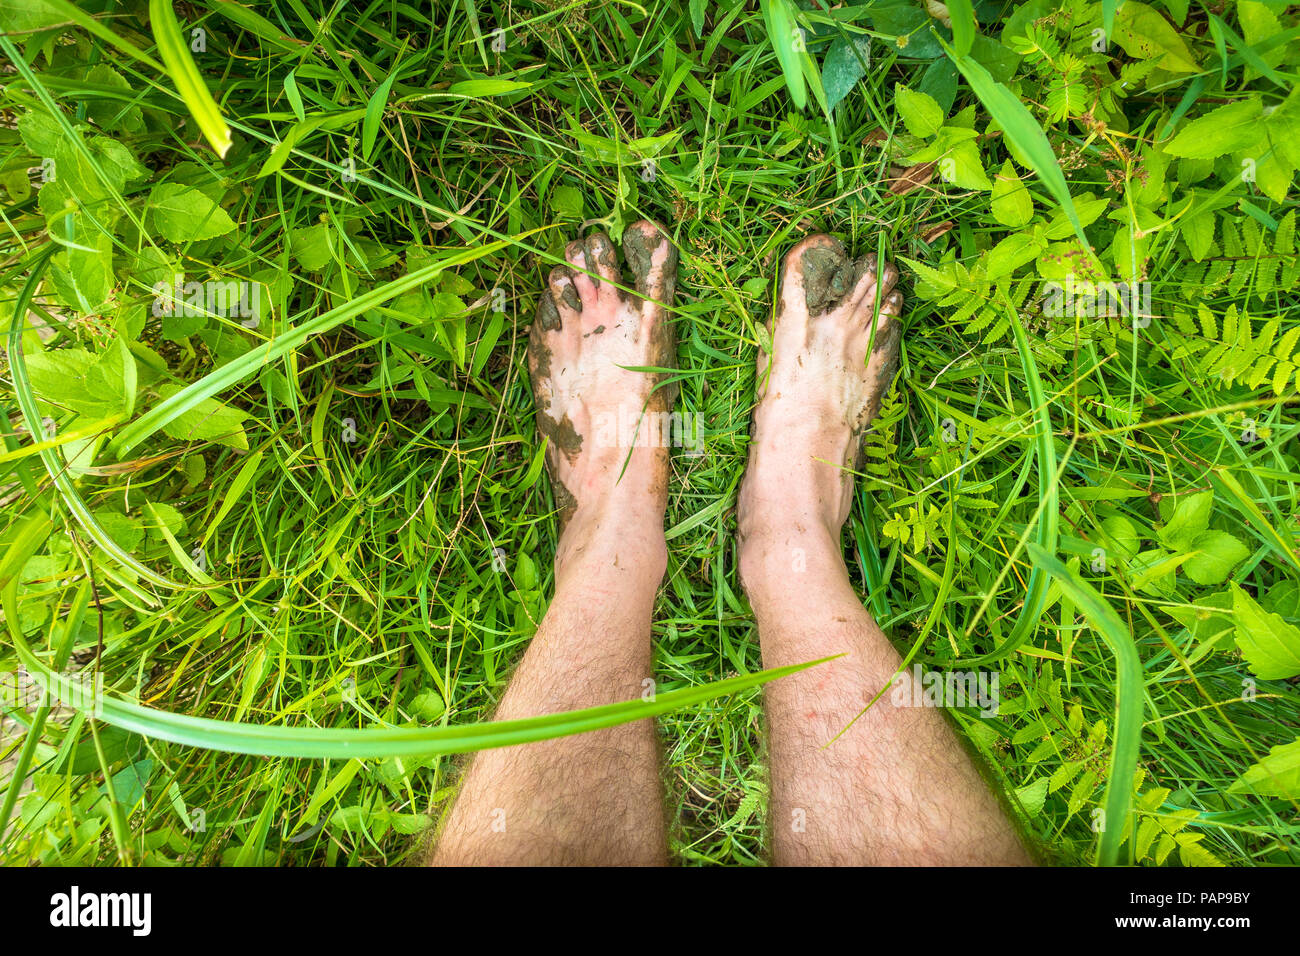 Muddy toes and feet while trekking barefoot through jungle plants in Sabang, Puerto Princesa - Palawan - Philippines - Stock Image